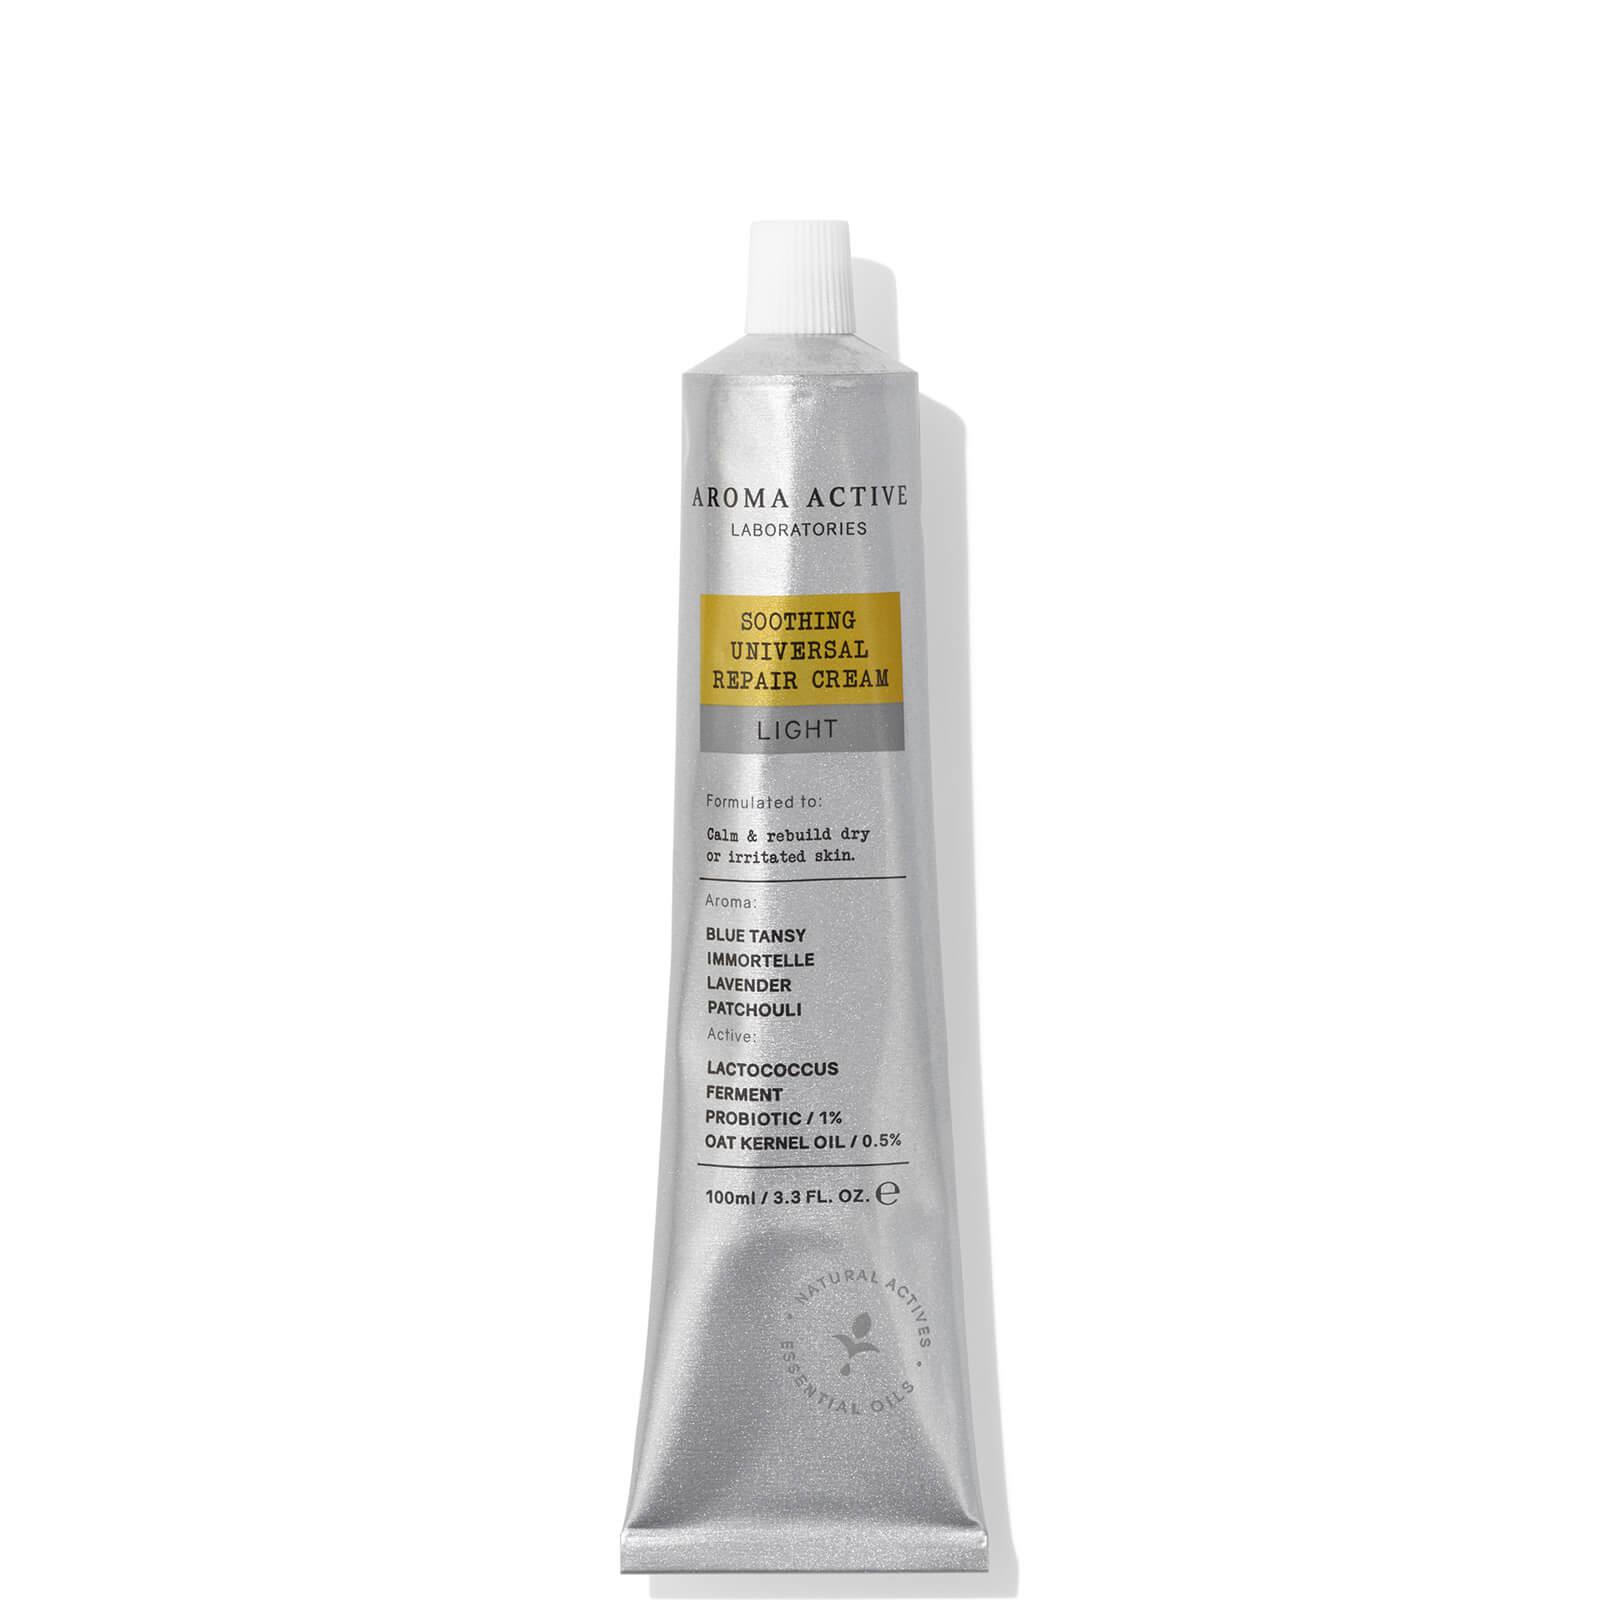 Купить Aroma Active Soothing Universal Repair Cream Light 100ml